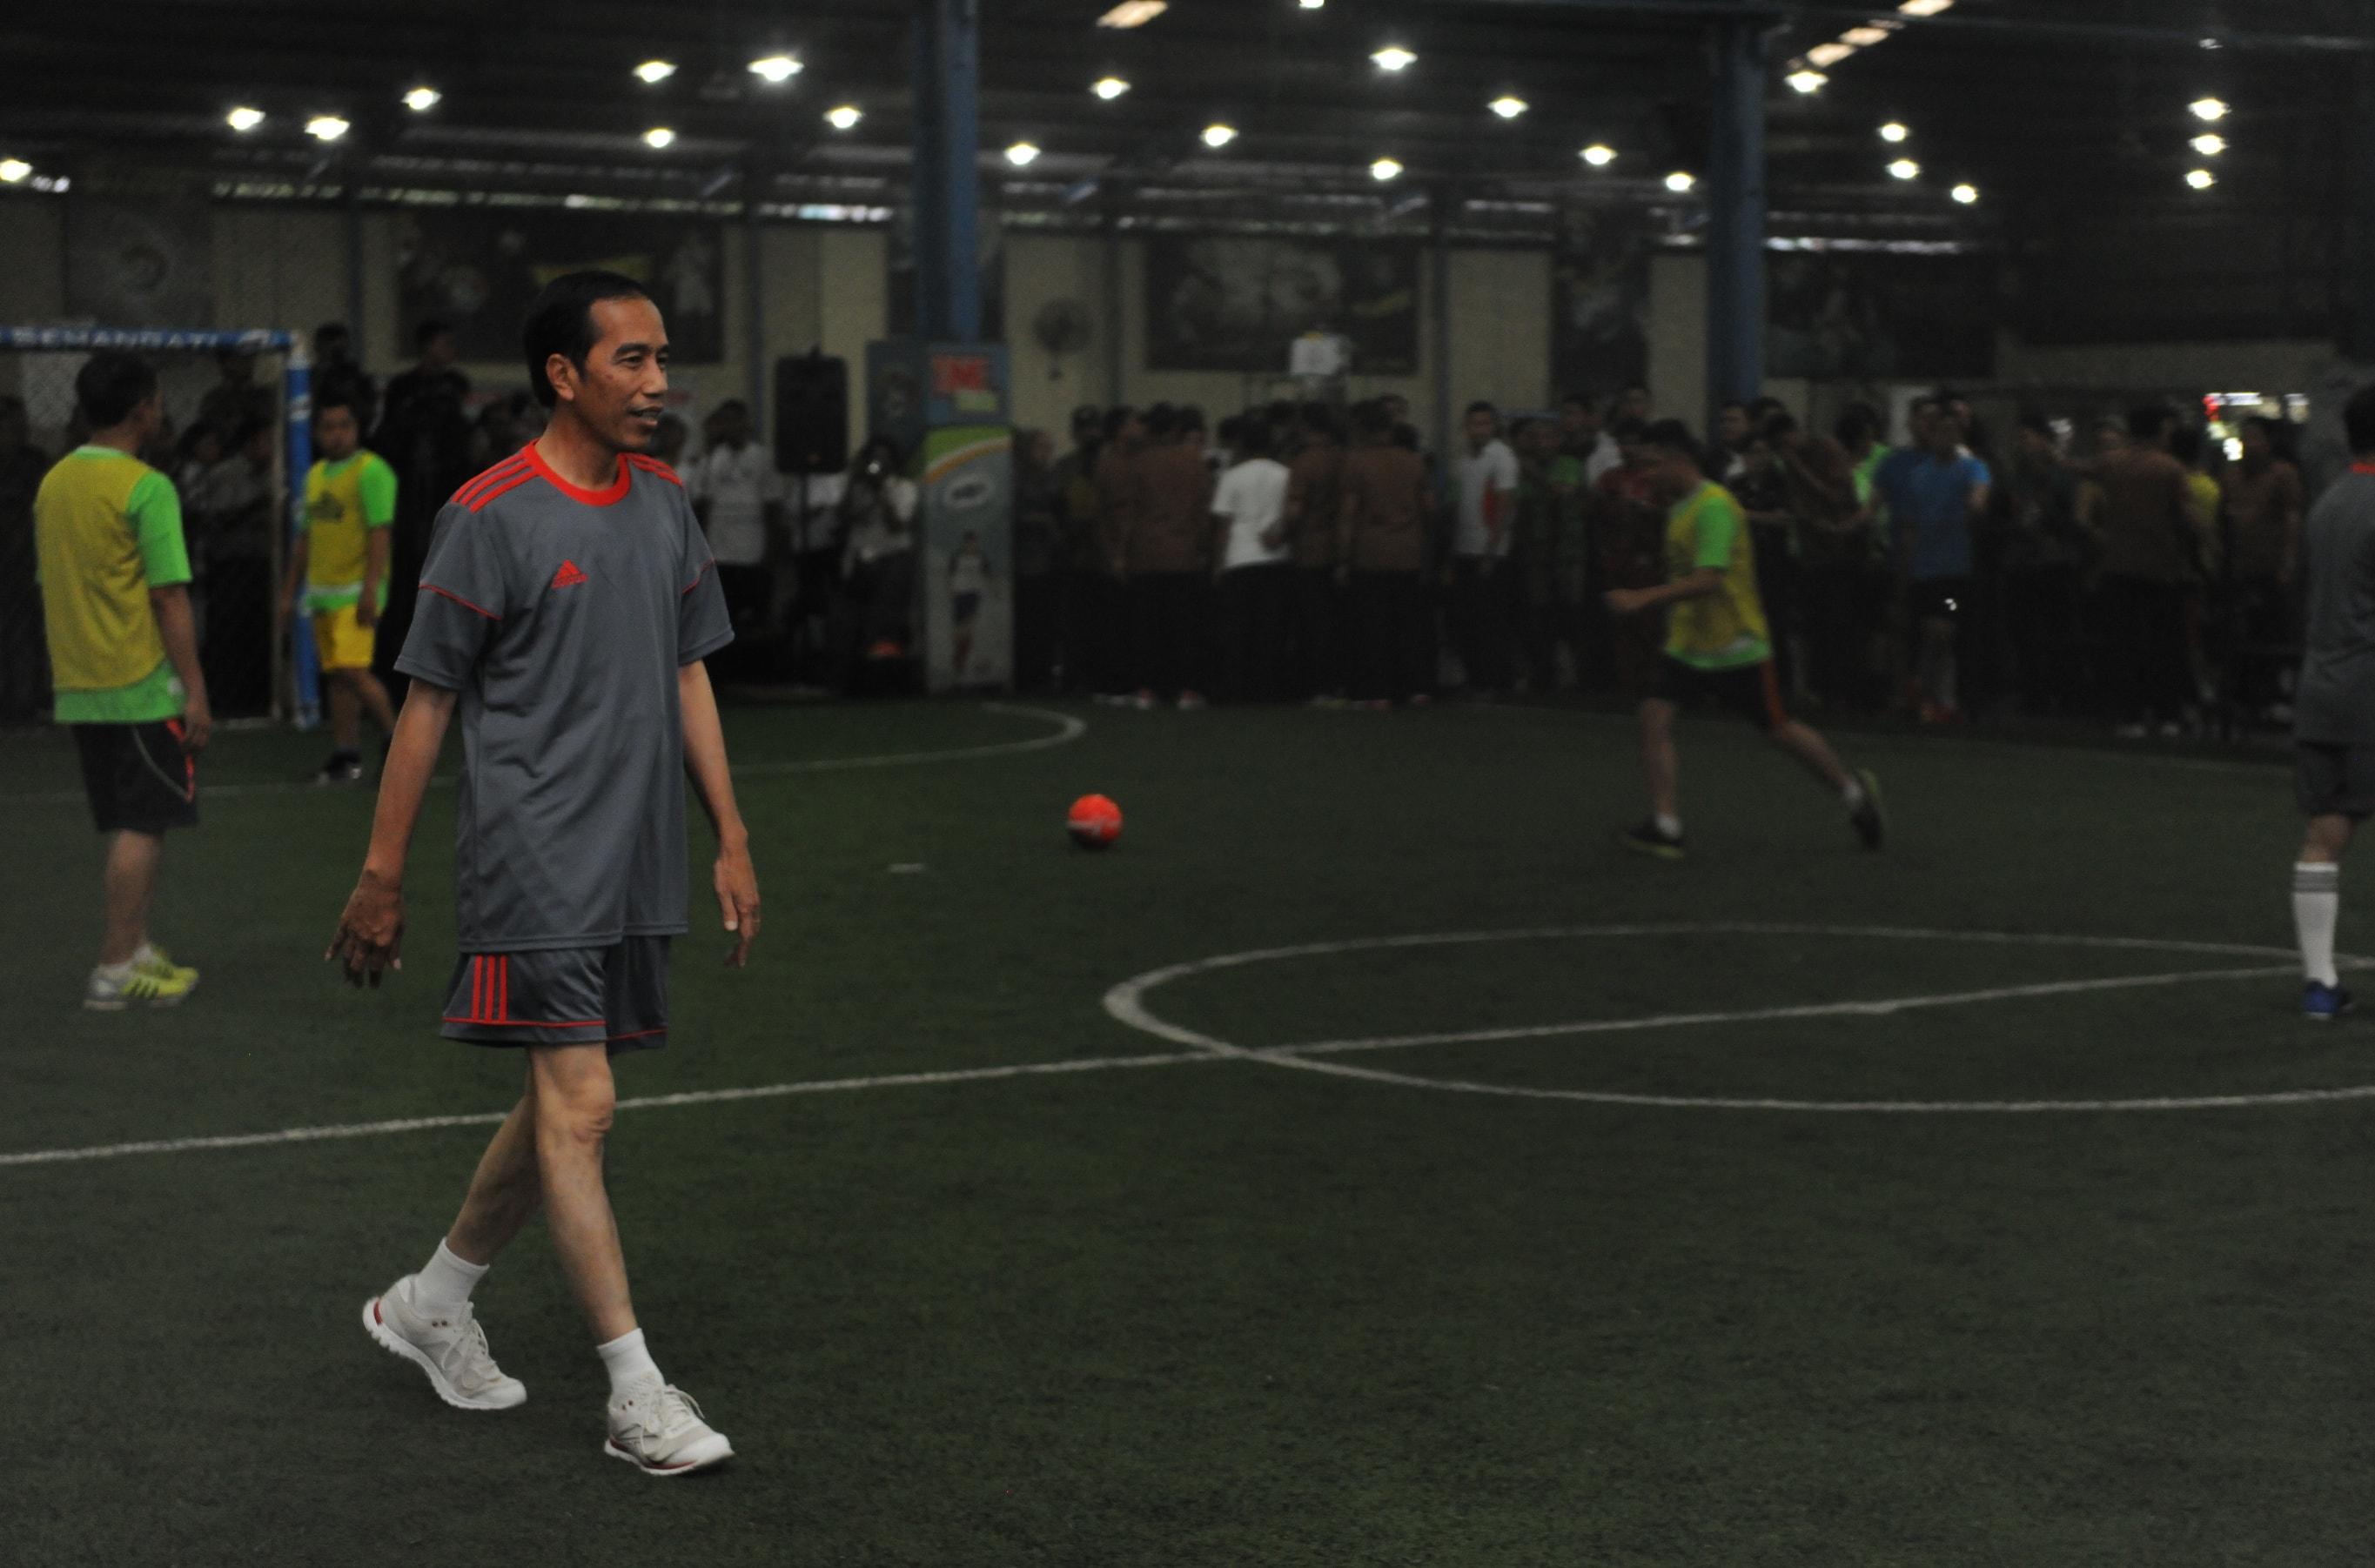 President Jokowi on a friendly futsal match with journalists at Time Futsal, Pegangsaan, Jakarta, on Tuesday (7/2) (Photo: PR/Jay)